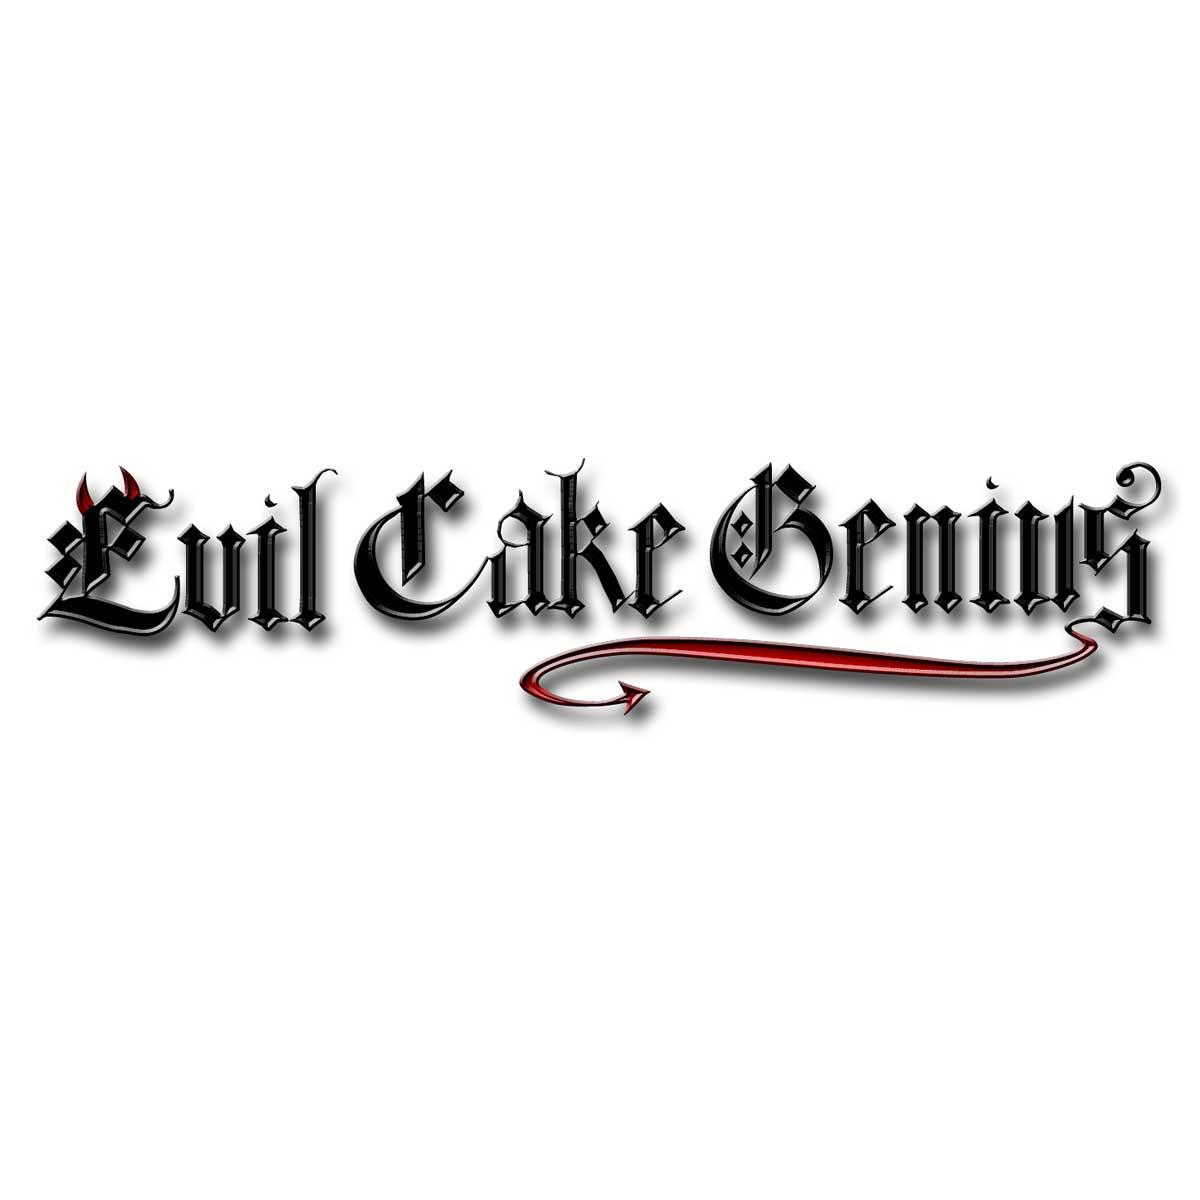 Mold 3D Unicorn Cake Accessories